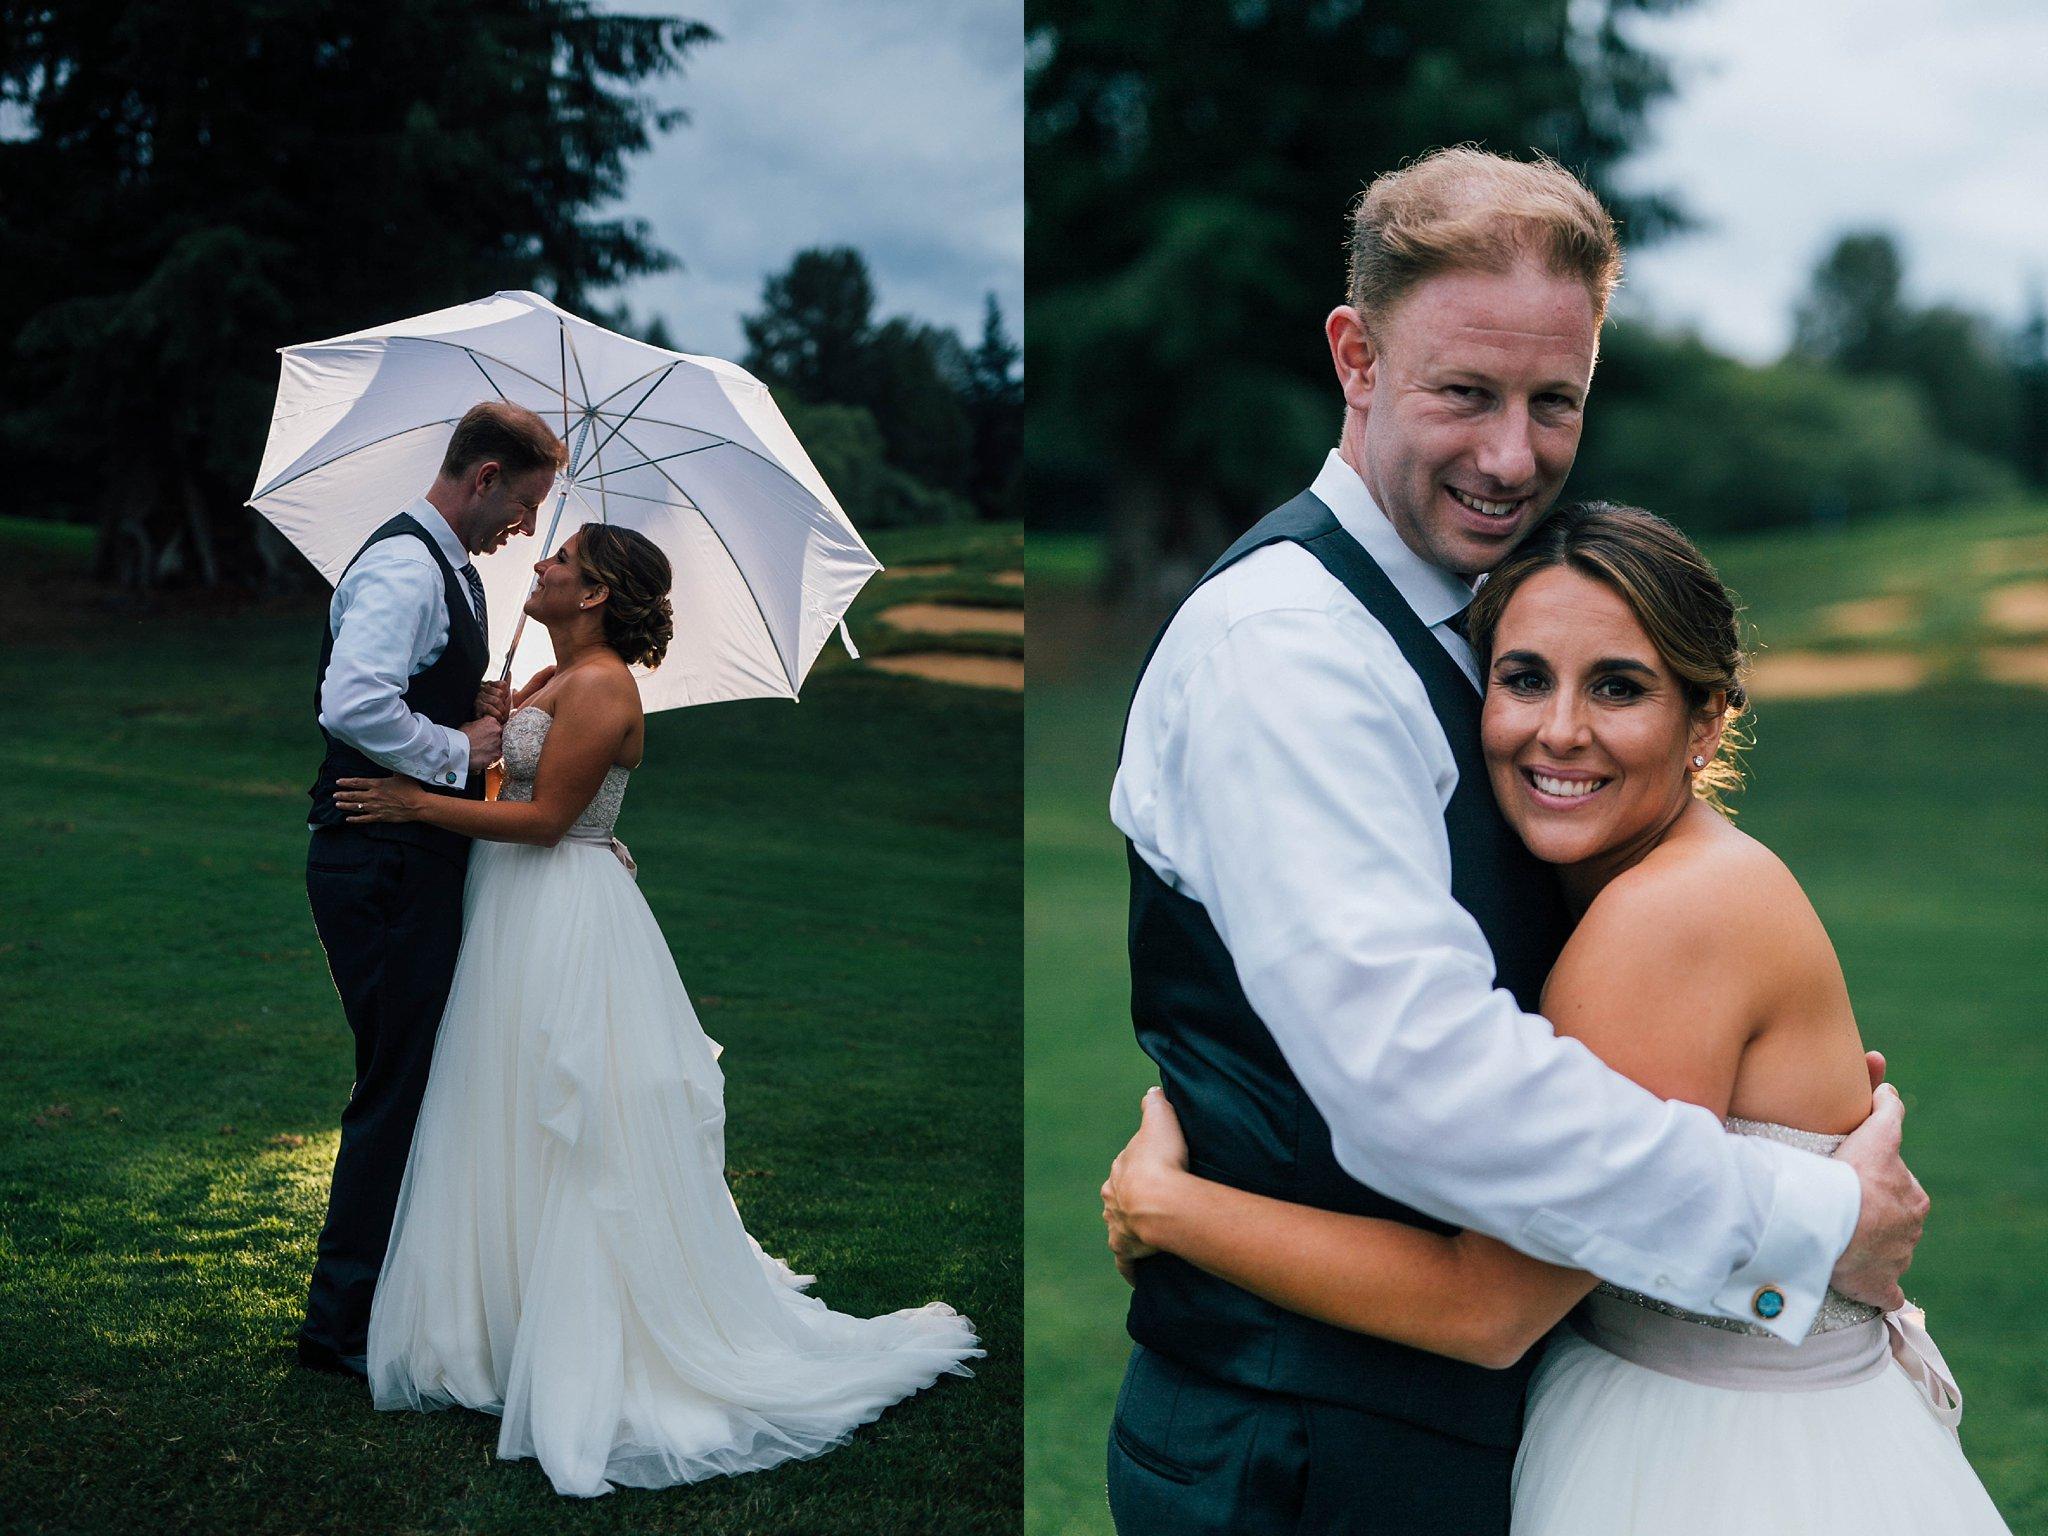 ashley_vos_seattle_wedding_photographer_0200.jpg